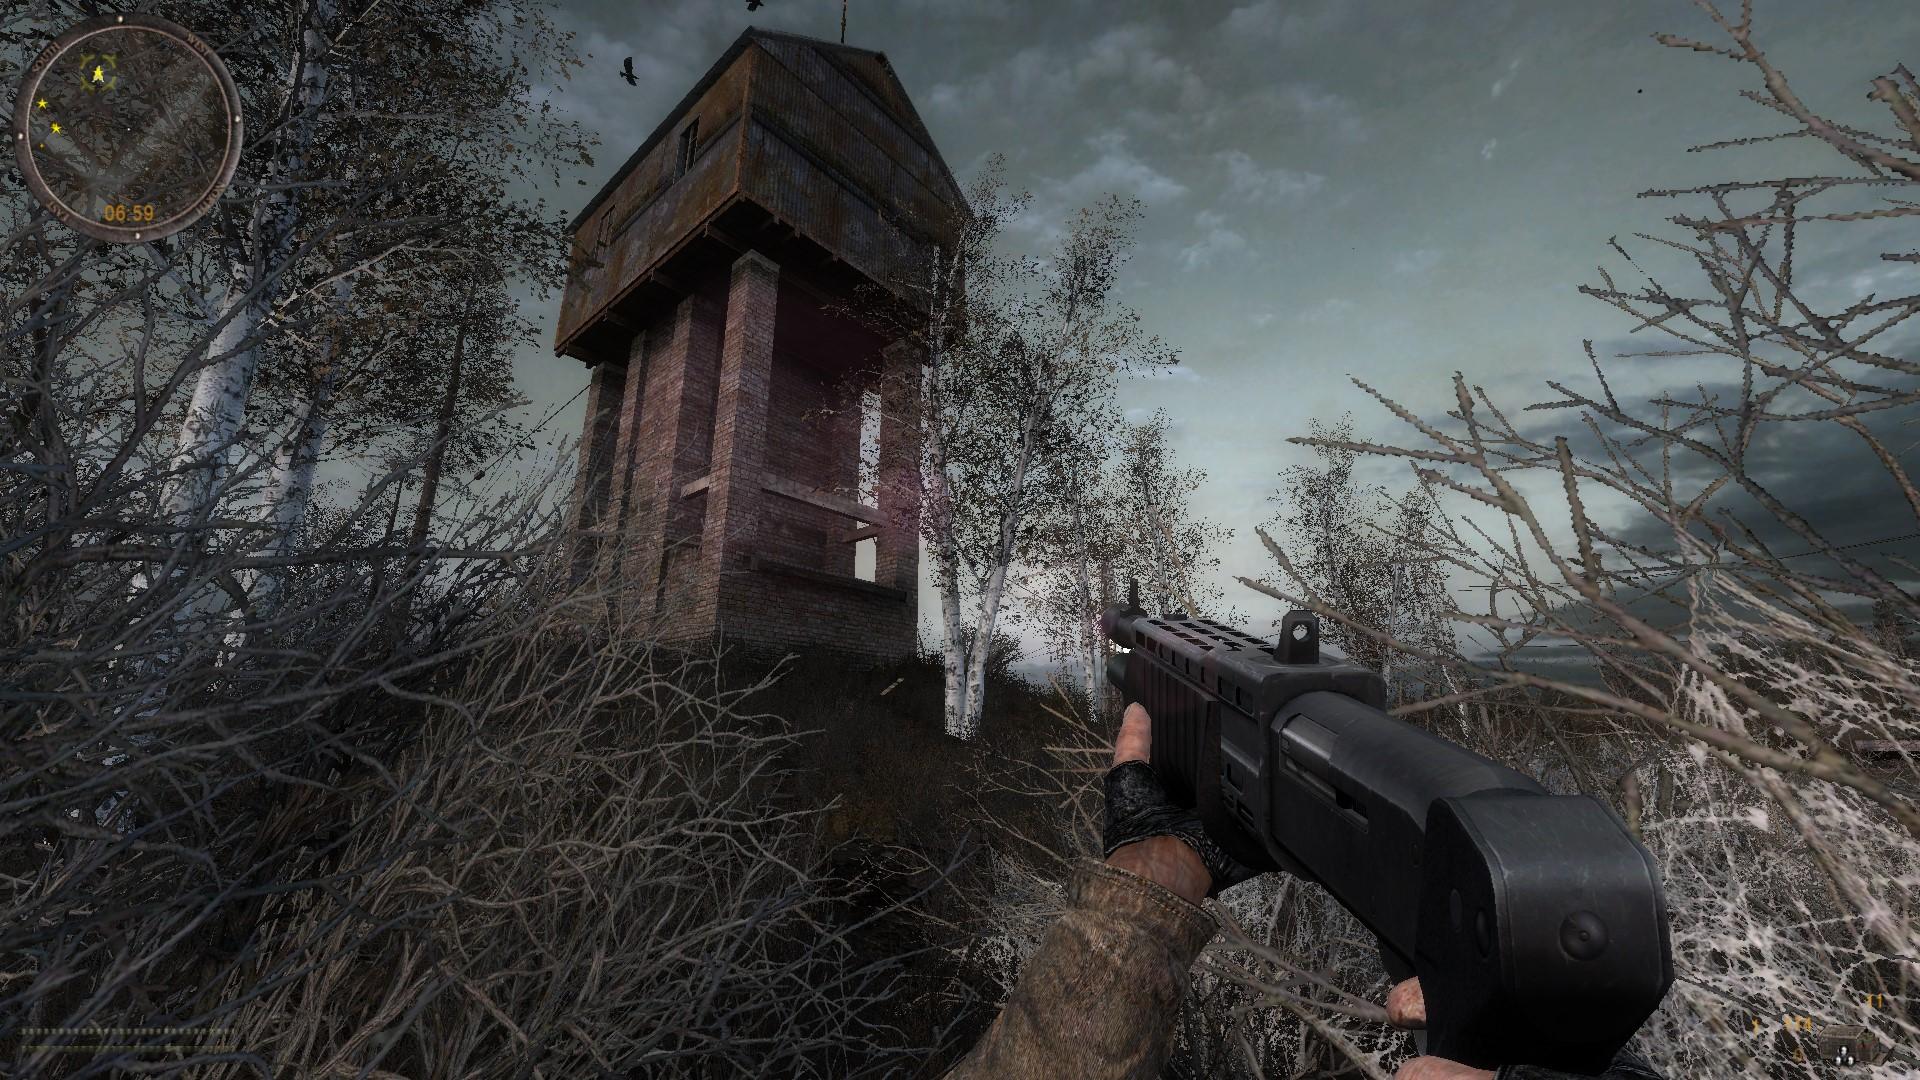 ss_Администратор_05-04-18_18-34-36_(jupiter).jpg - S.T.A.L.K.E.R.: Call of Pripyat